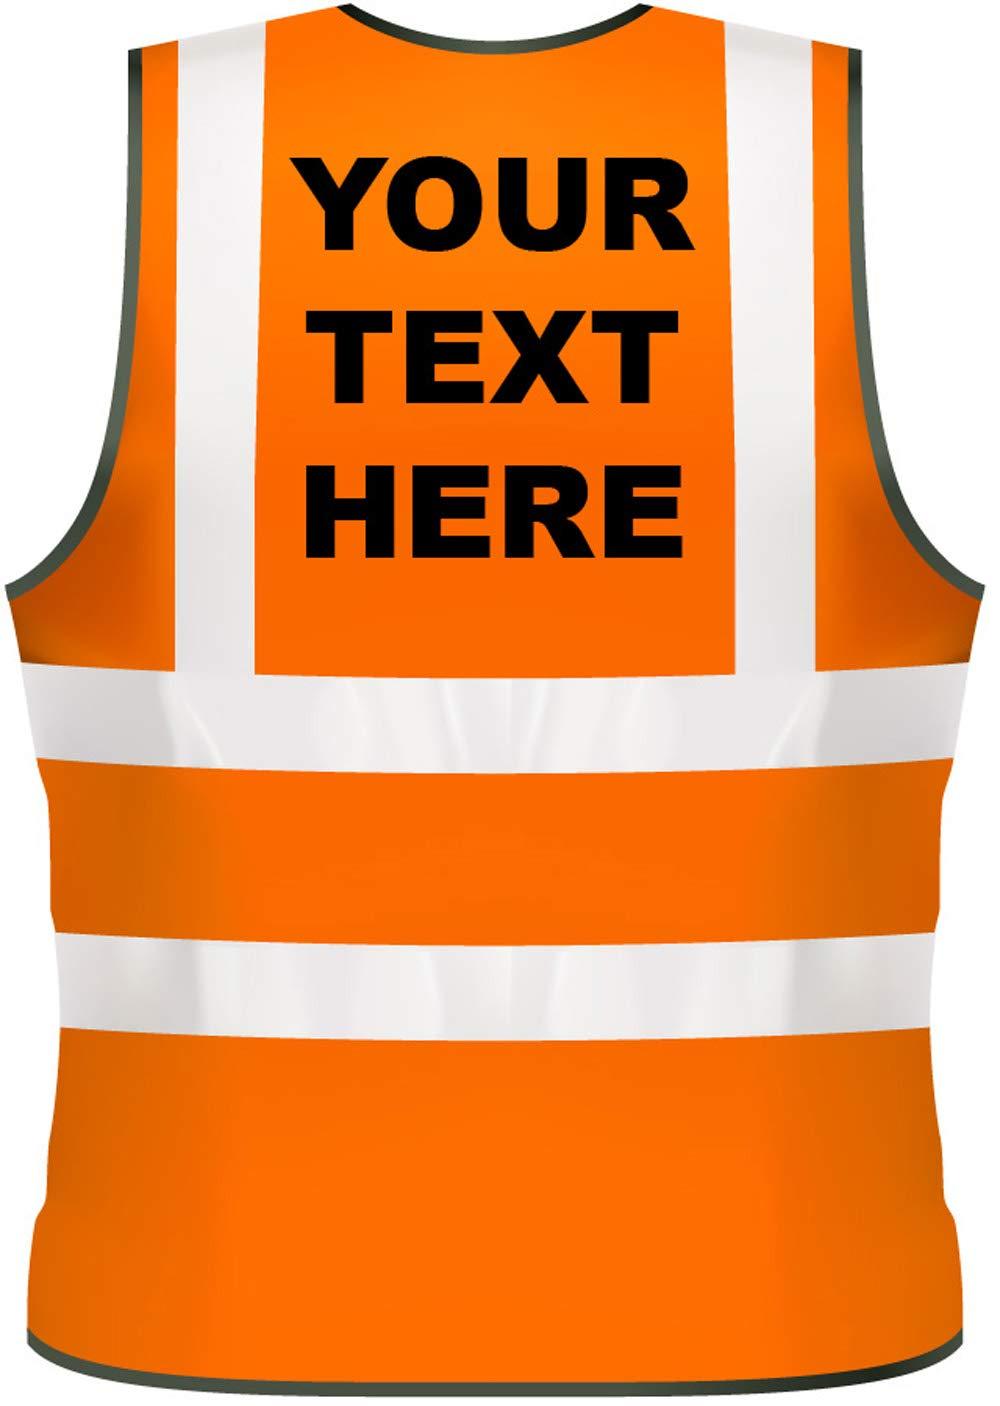 XL, Pink Hi Vis Personalised Vest Safety Reflective Waistcoat Security Hi Viz